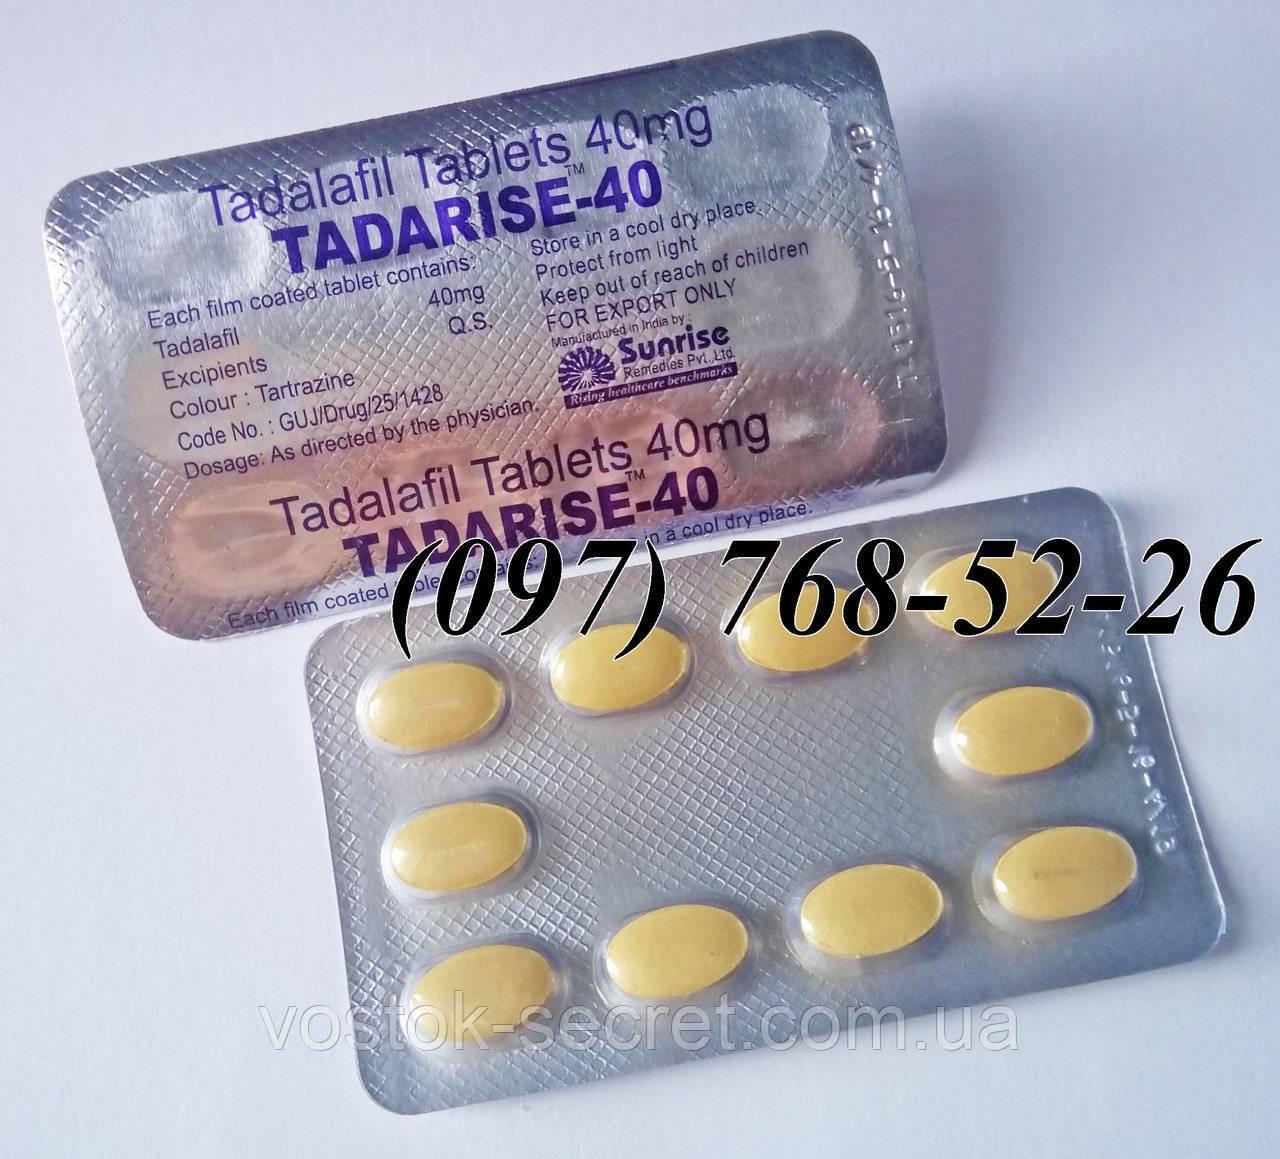 Таблетки extra super tadarise